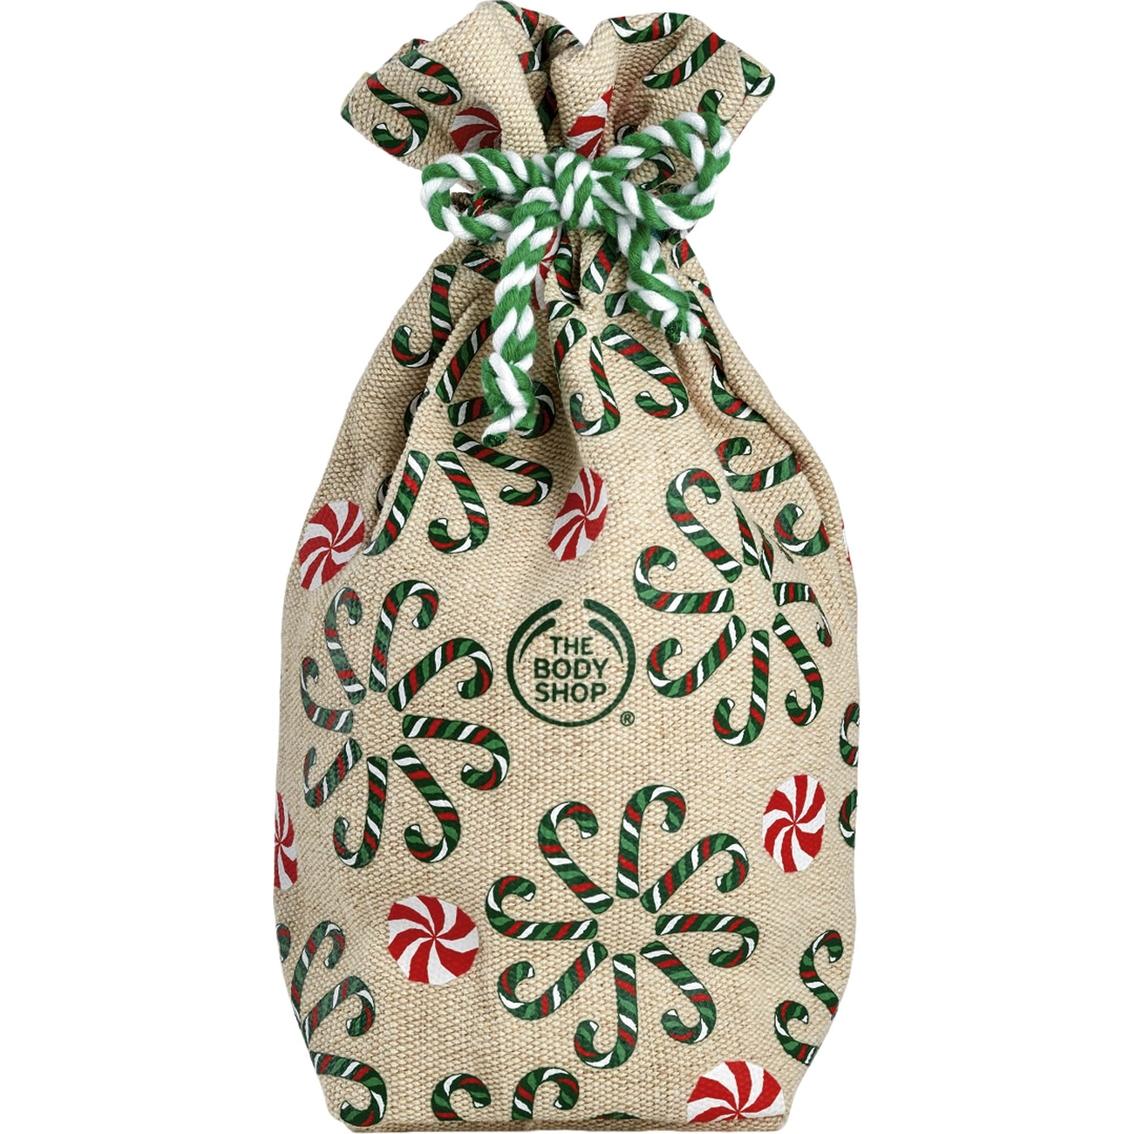 The Body Shop Peppermint Candy Cane Festive Picks 4 Pc Gift Set